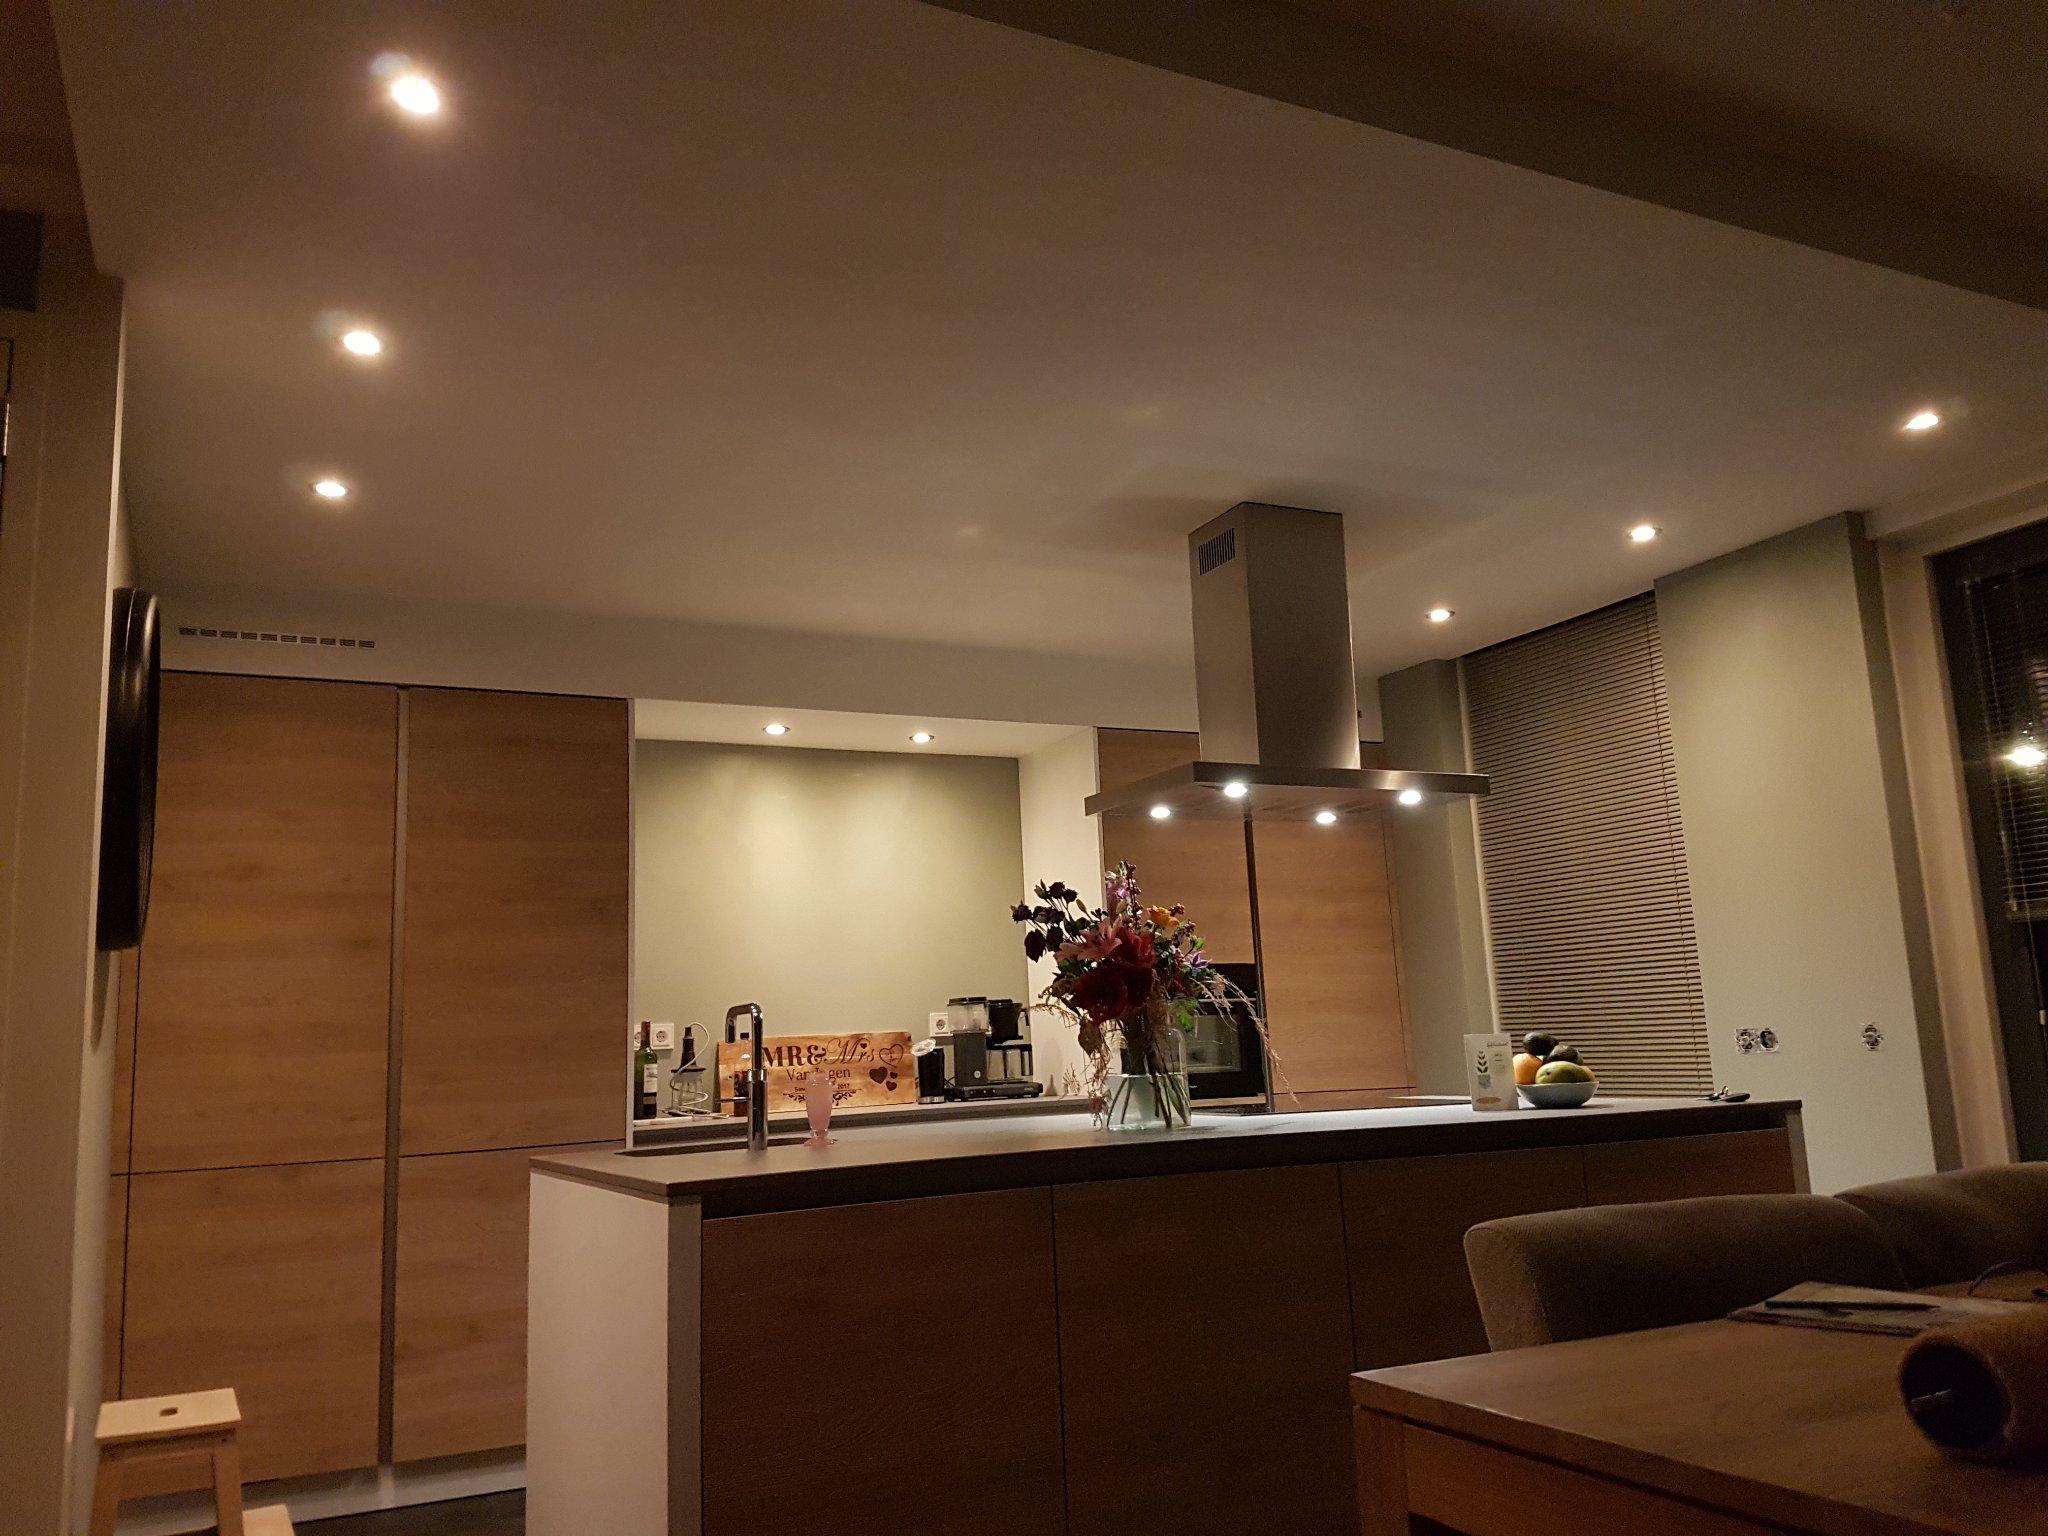 Afzuigkap In Plafond : Verlaagd plafond maken met spots en afzuigkap werkspot